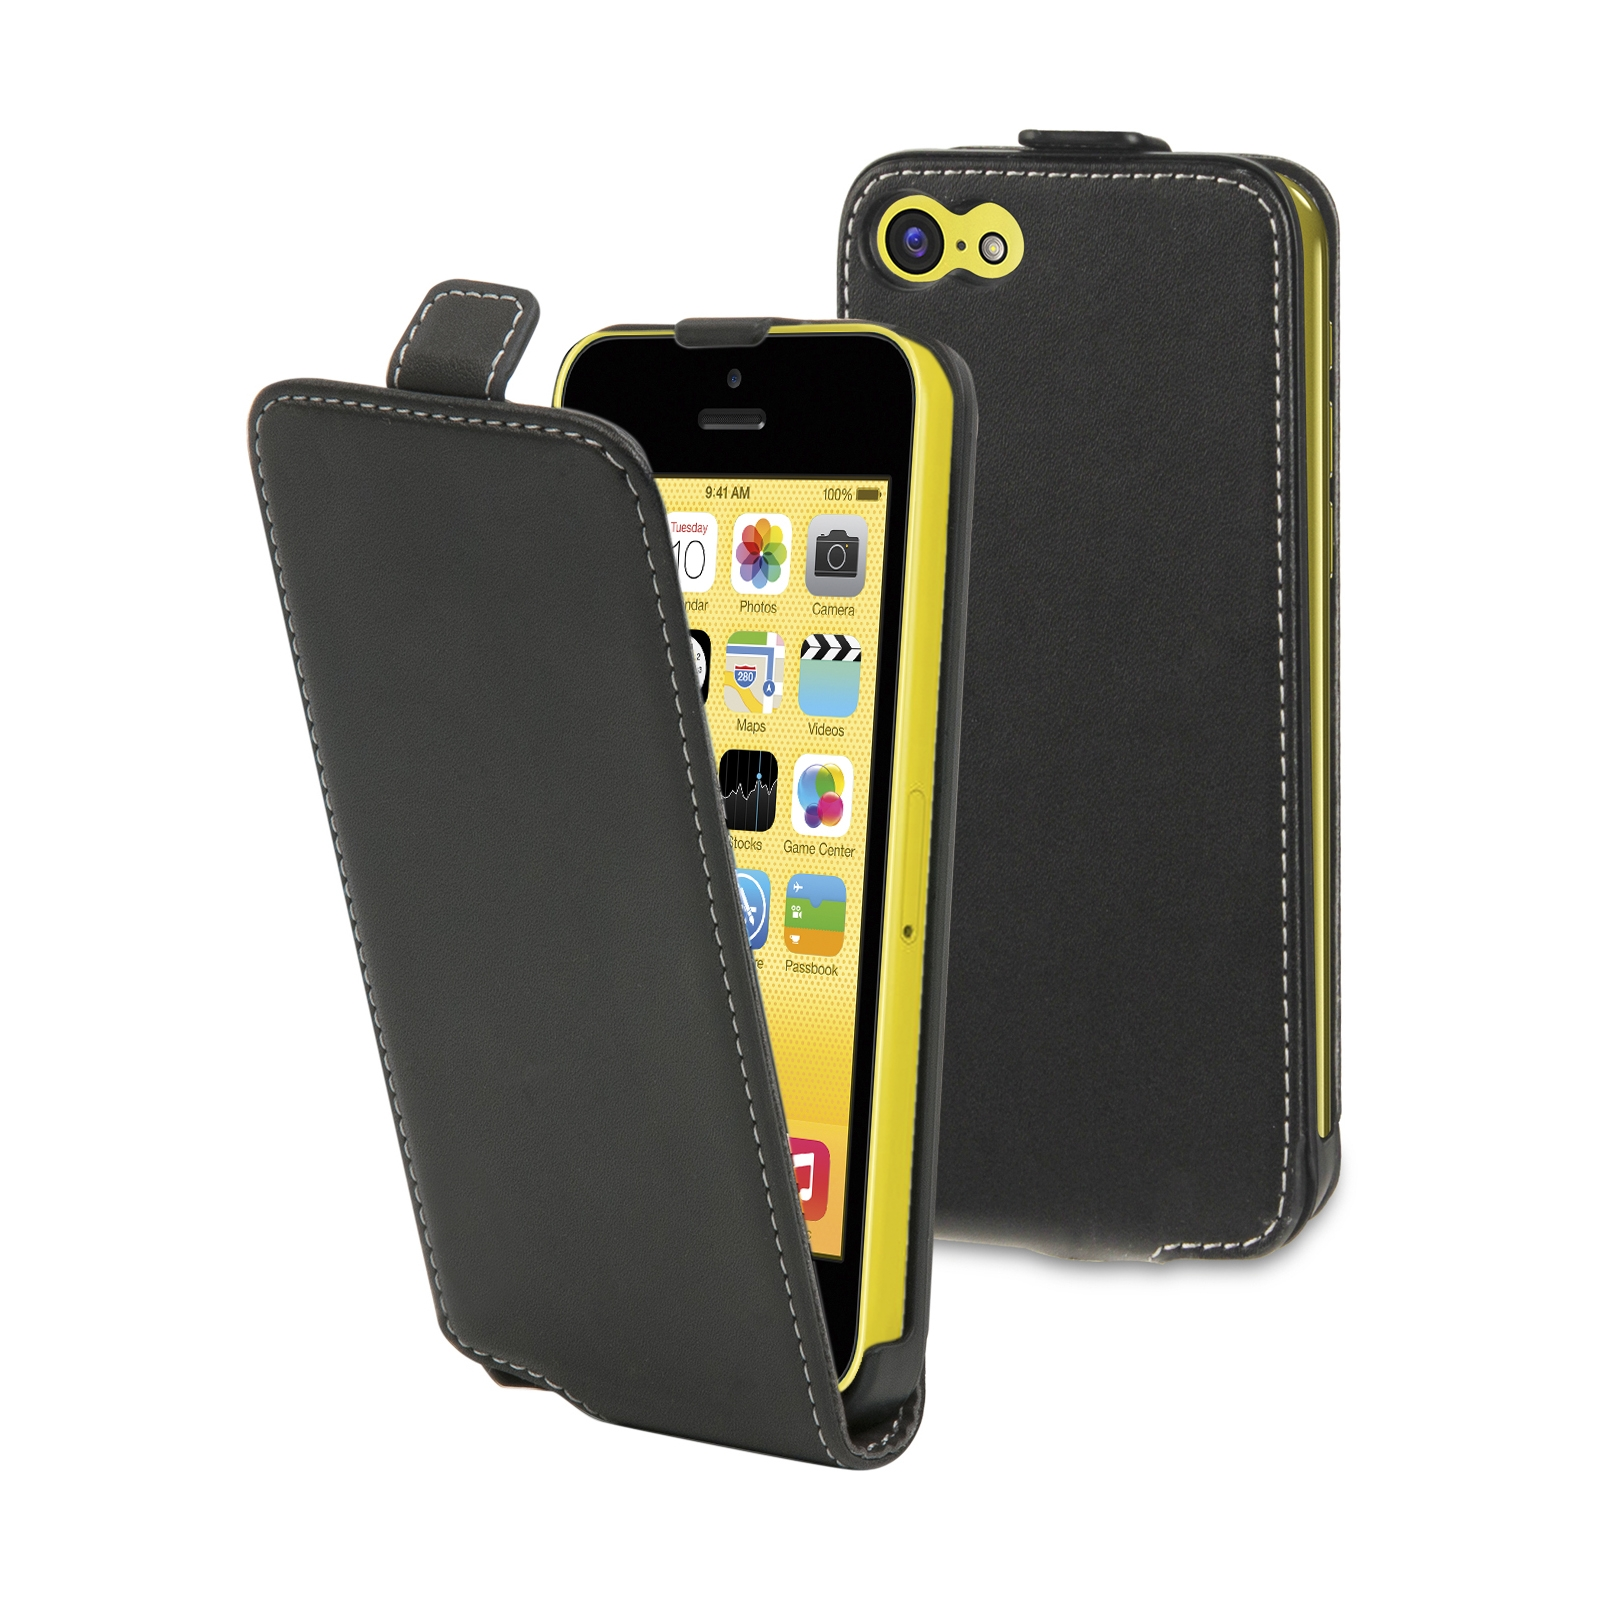 Etui flap noir Iphone 5c